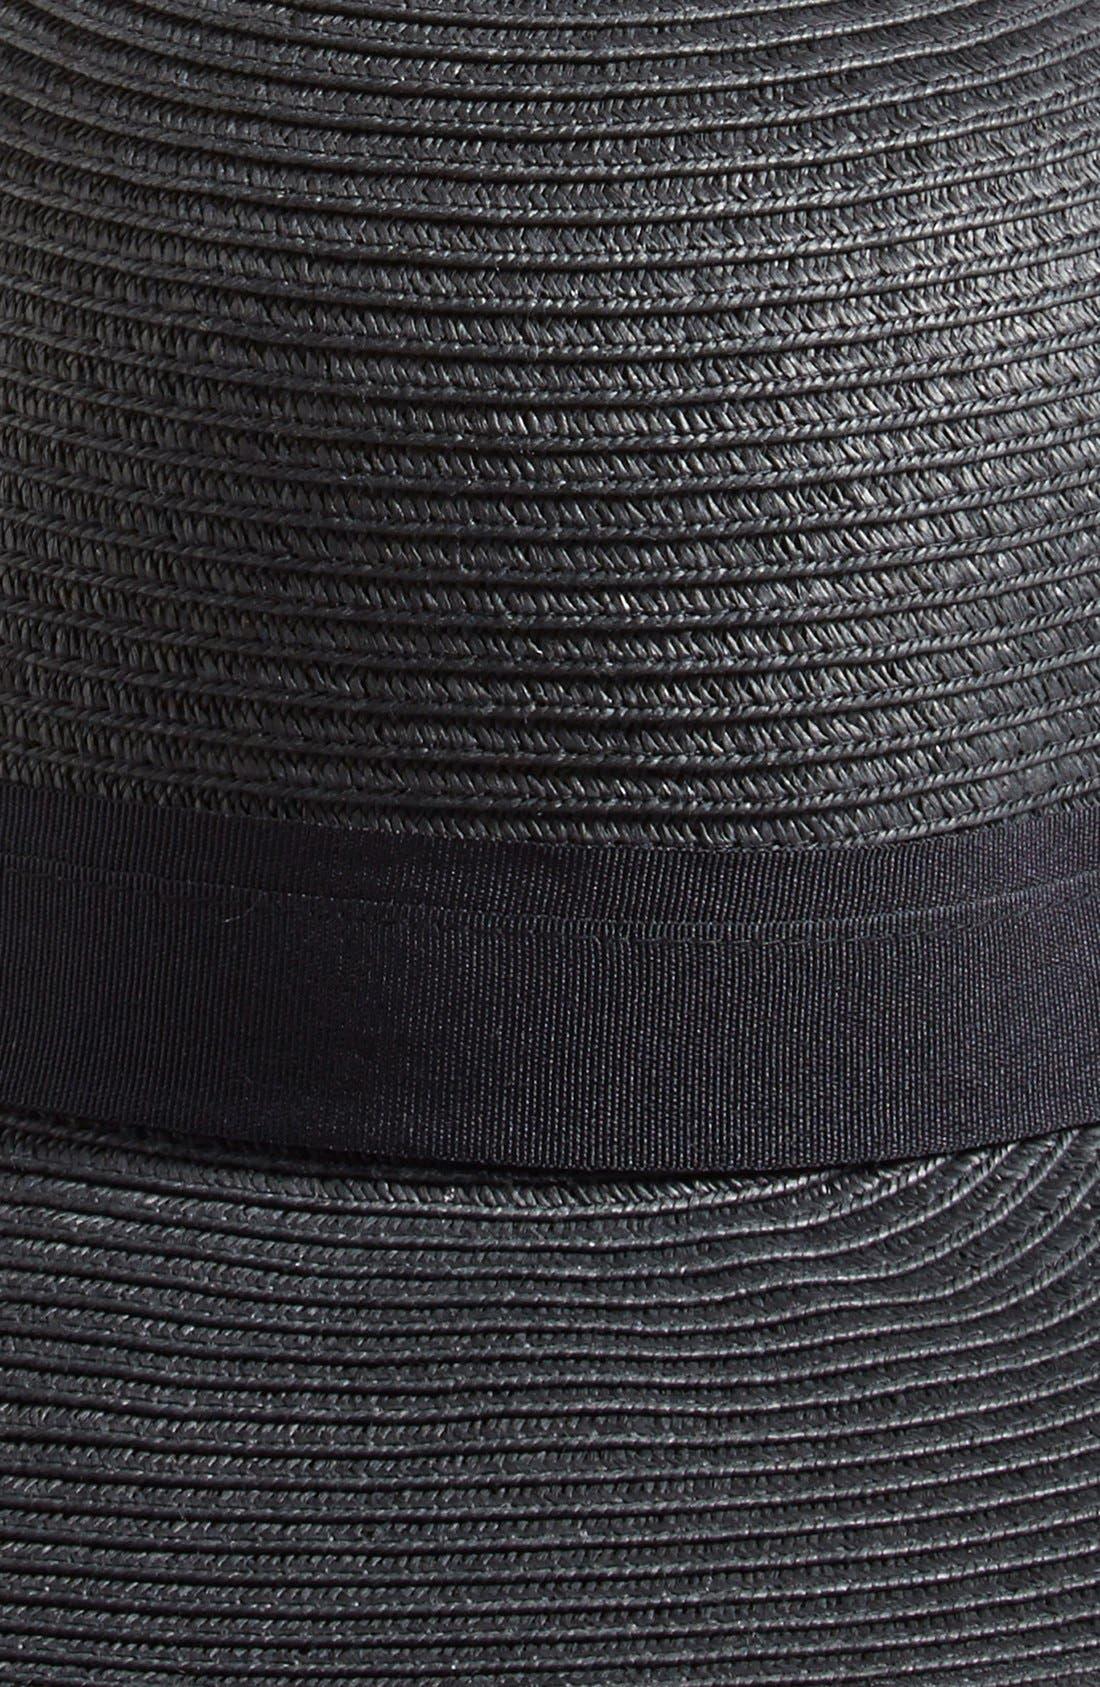 Asymmetrical Brim Floppy Hat,                             Alternate thumbnail 2, color,                             001